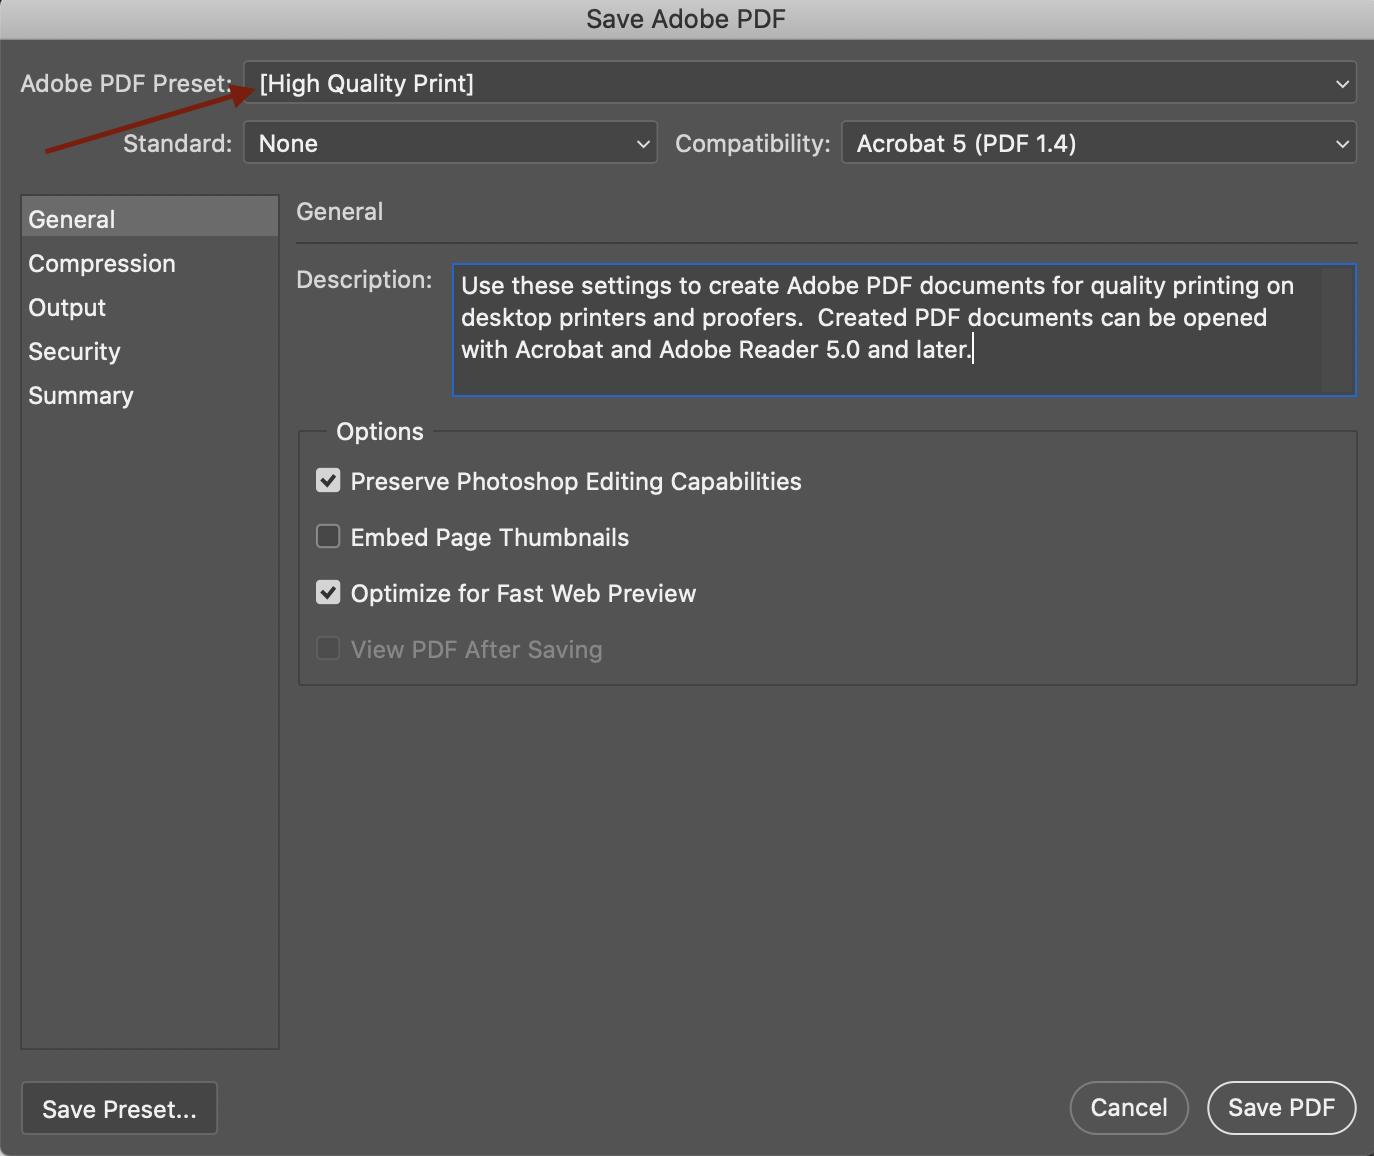 Screenshot of saving a file as a Adobe PDF Preset. Choose High Quality Print